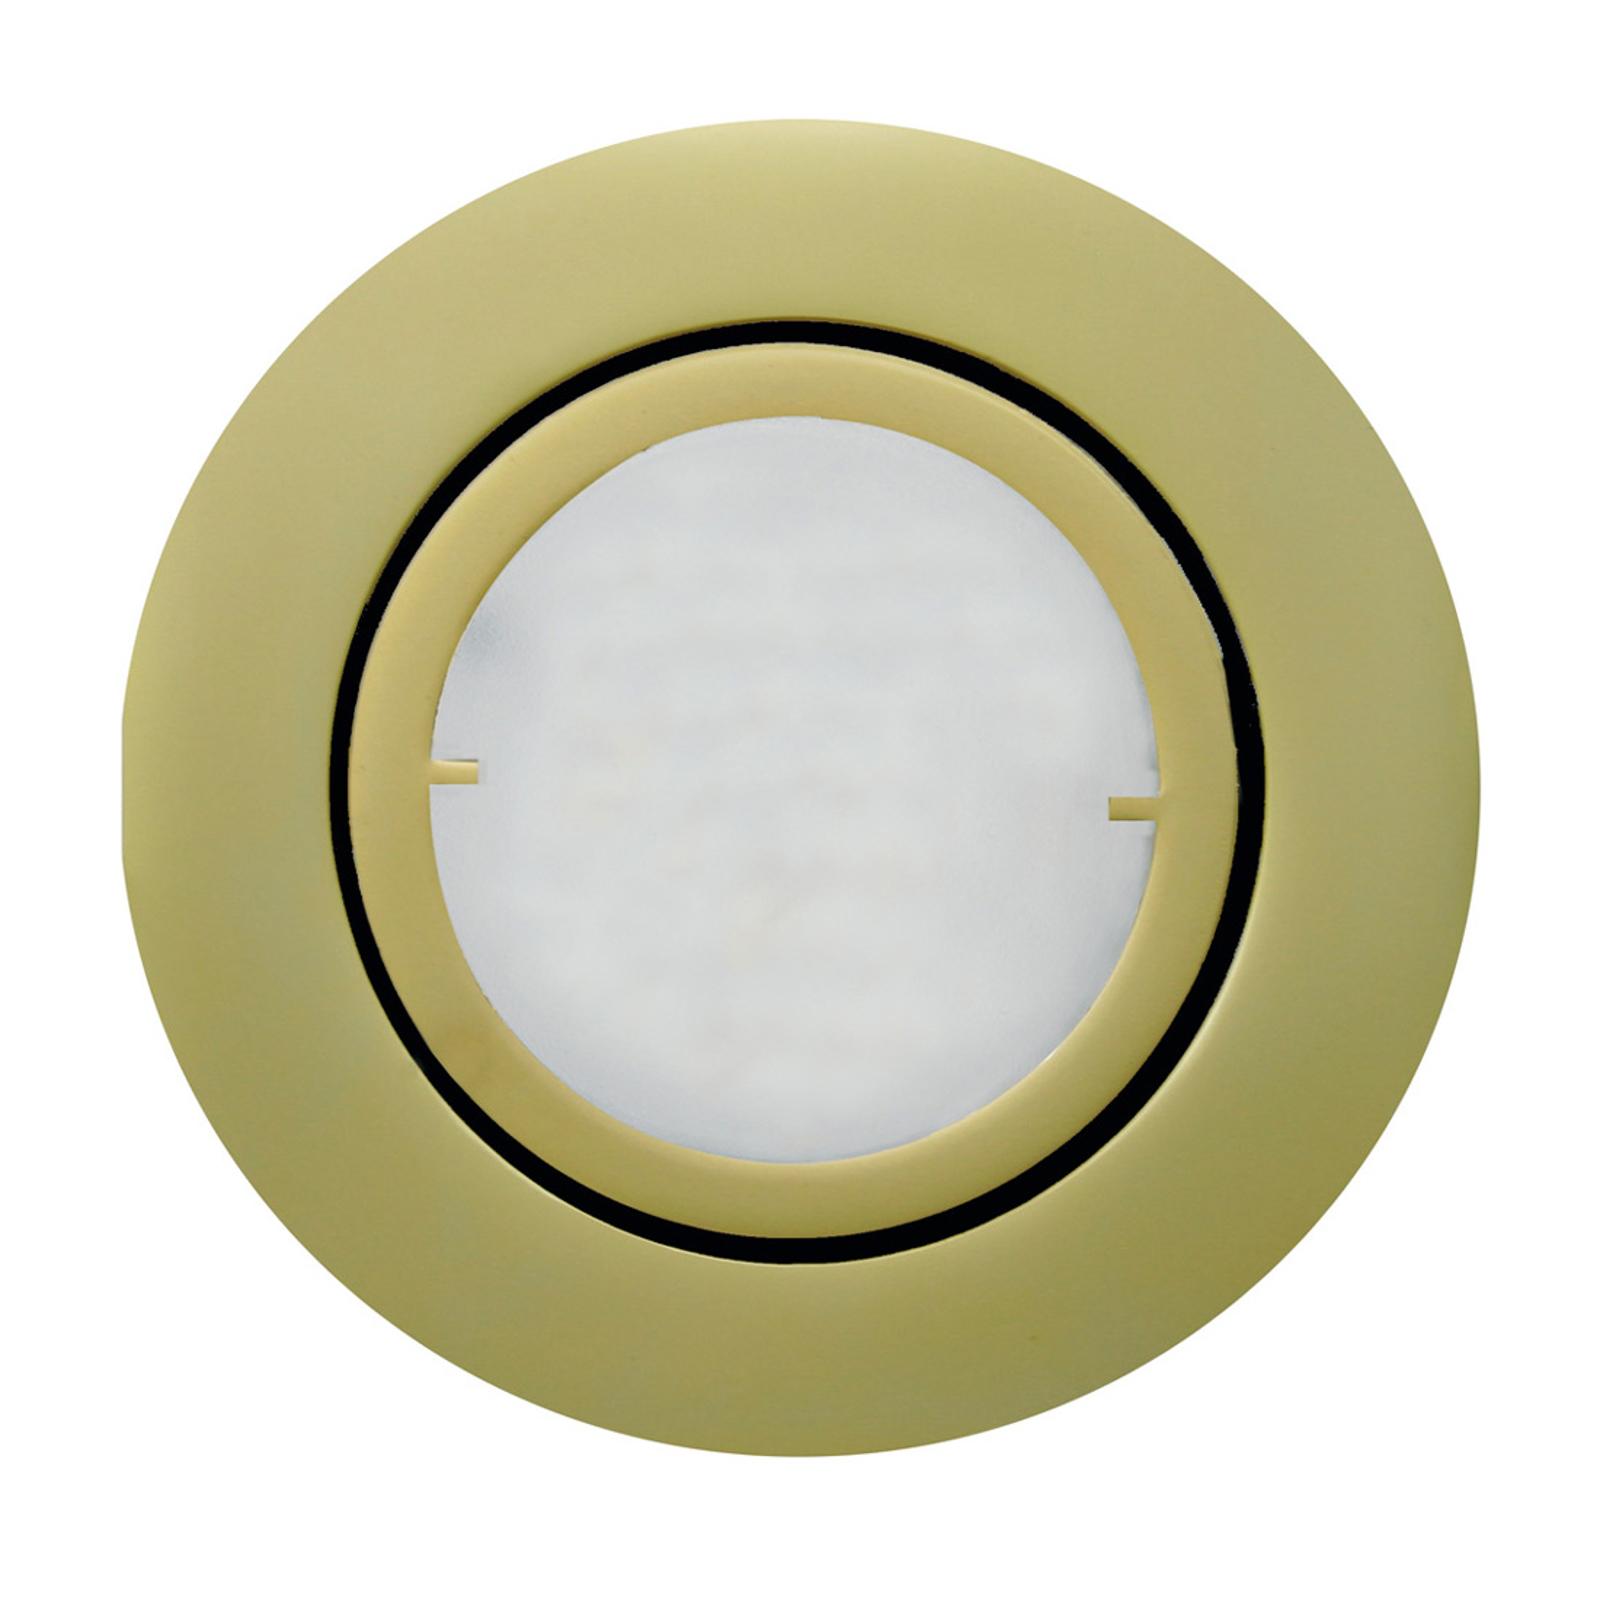 Joanie mat gylden LED-indbygningslampe